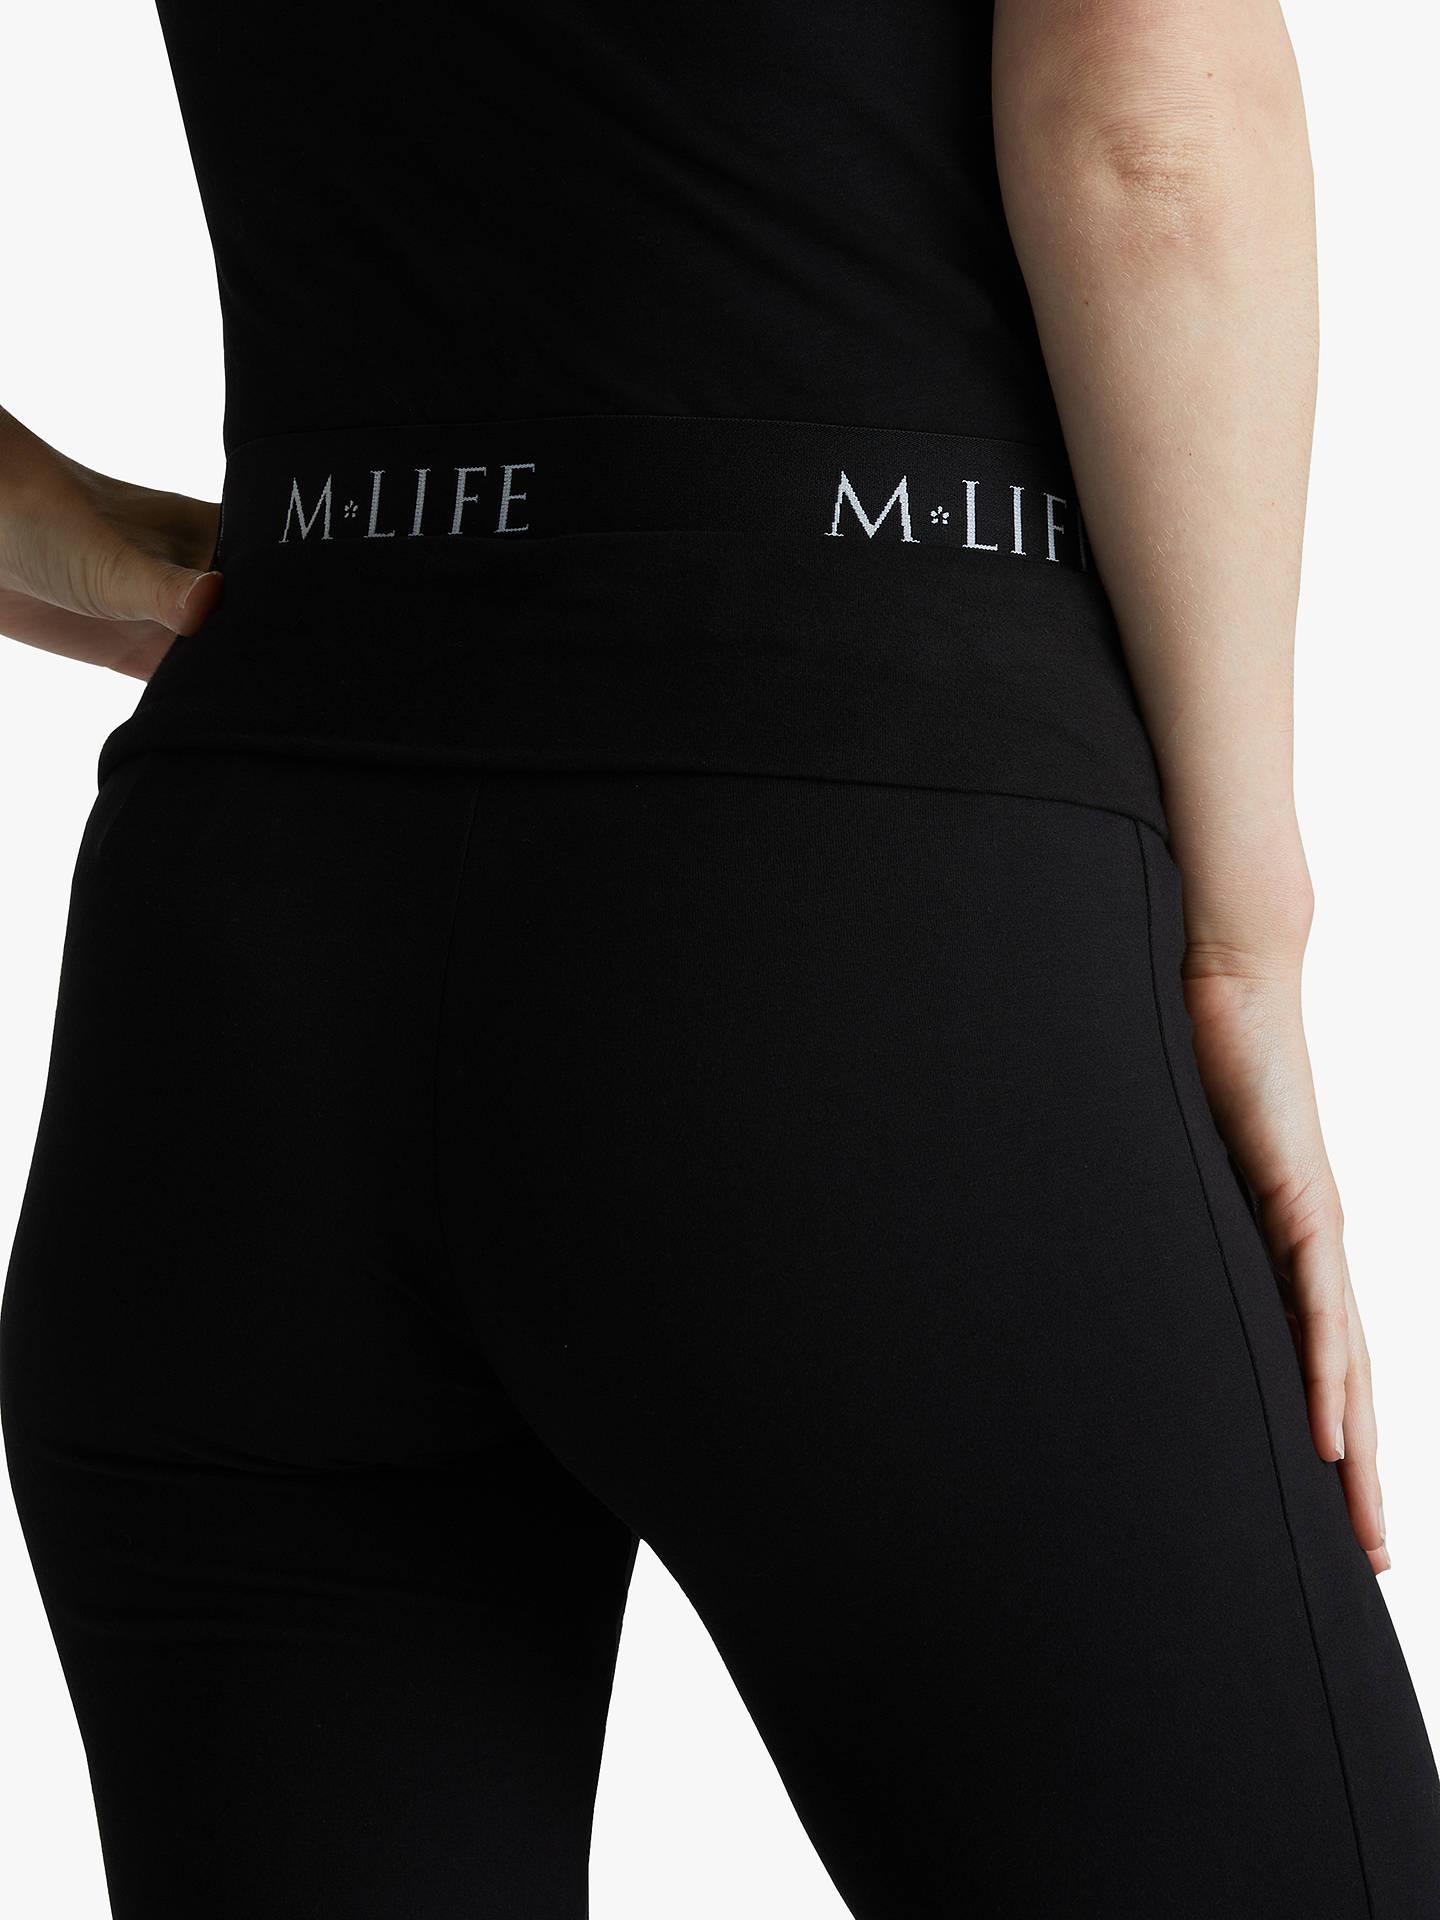 933c76e0c35 Buy M Life Divine Drawstring Yoga Pants, Flint Melange, XS Online at  johnlewis.